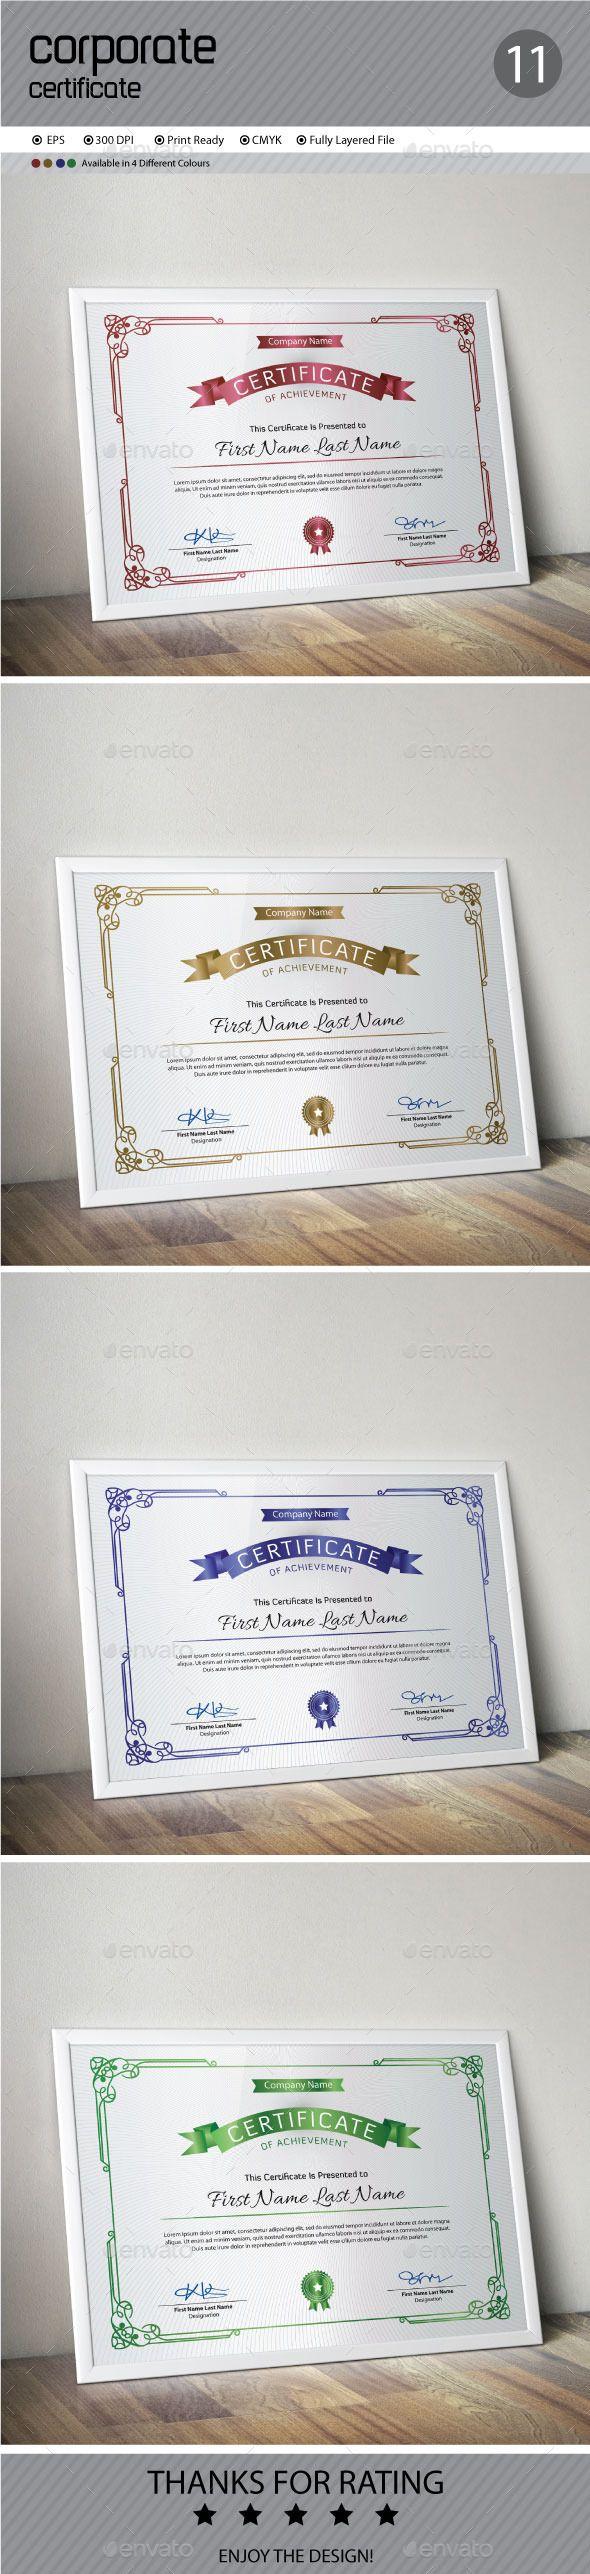 best 25 certificate templates ideas on pinterest